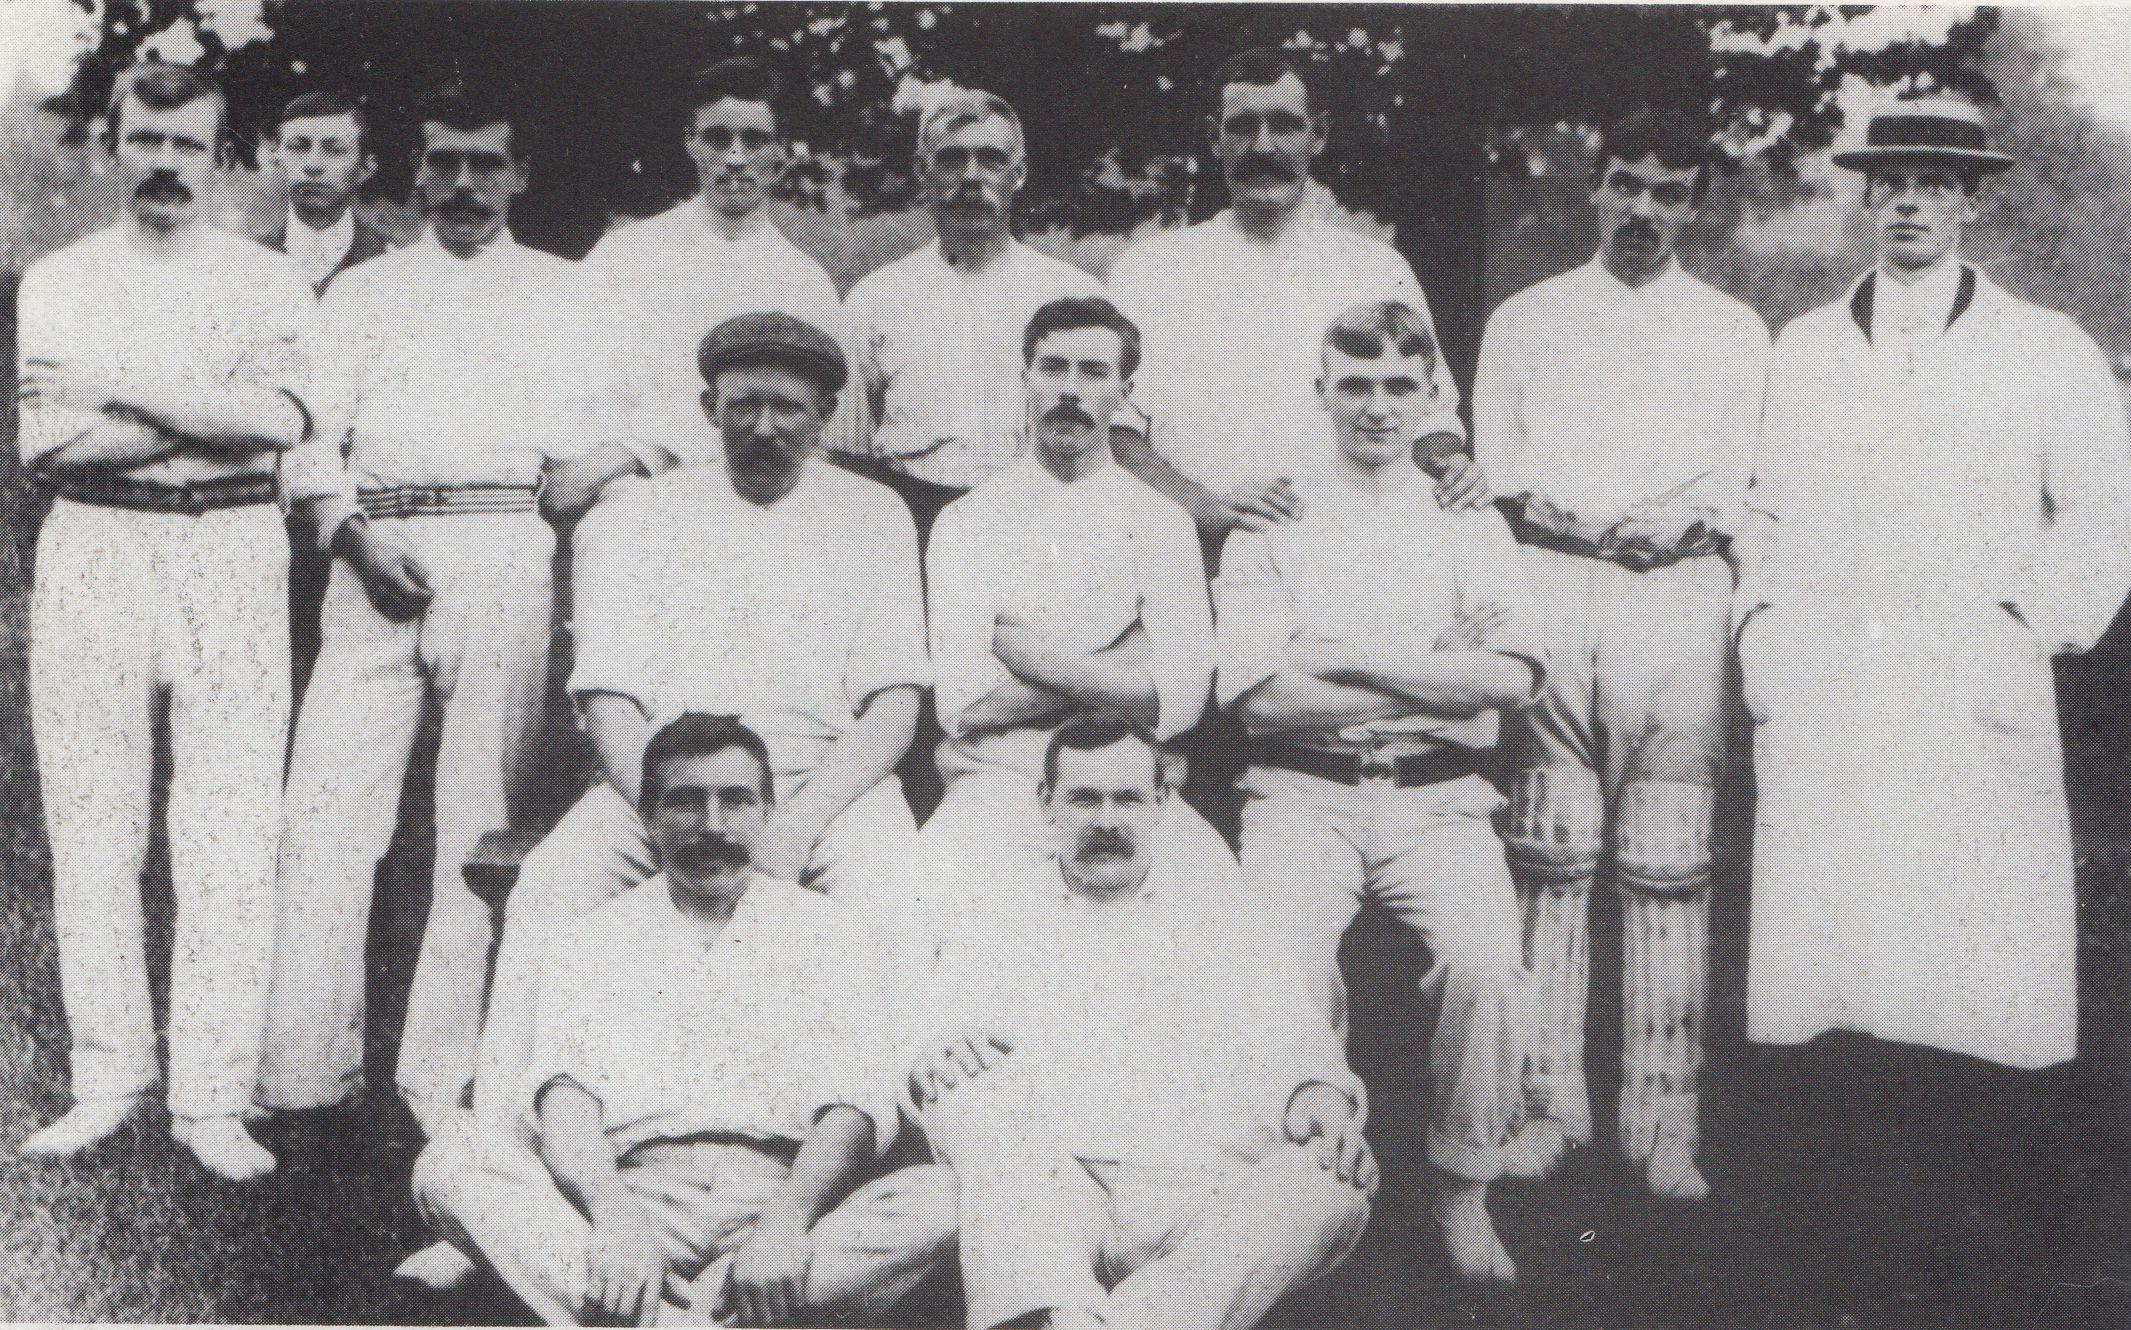 fpoh56_cricket_c.1920_0001.jpg